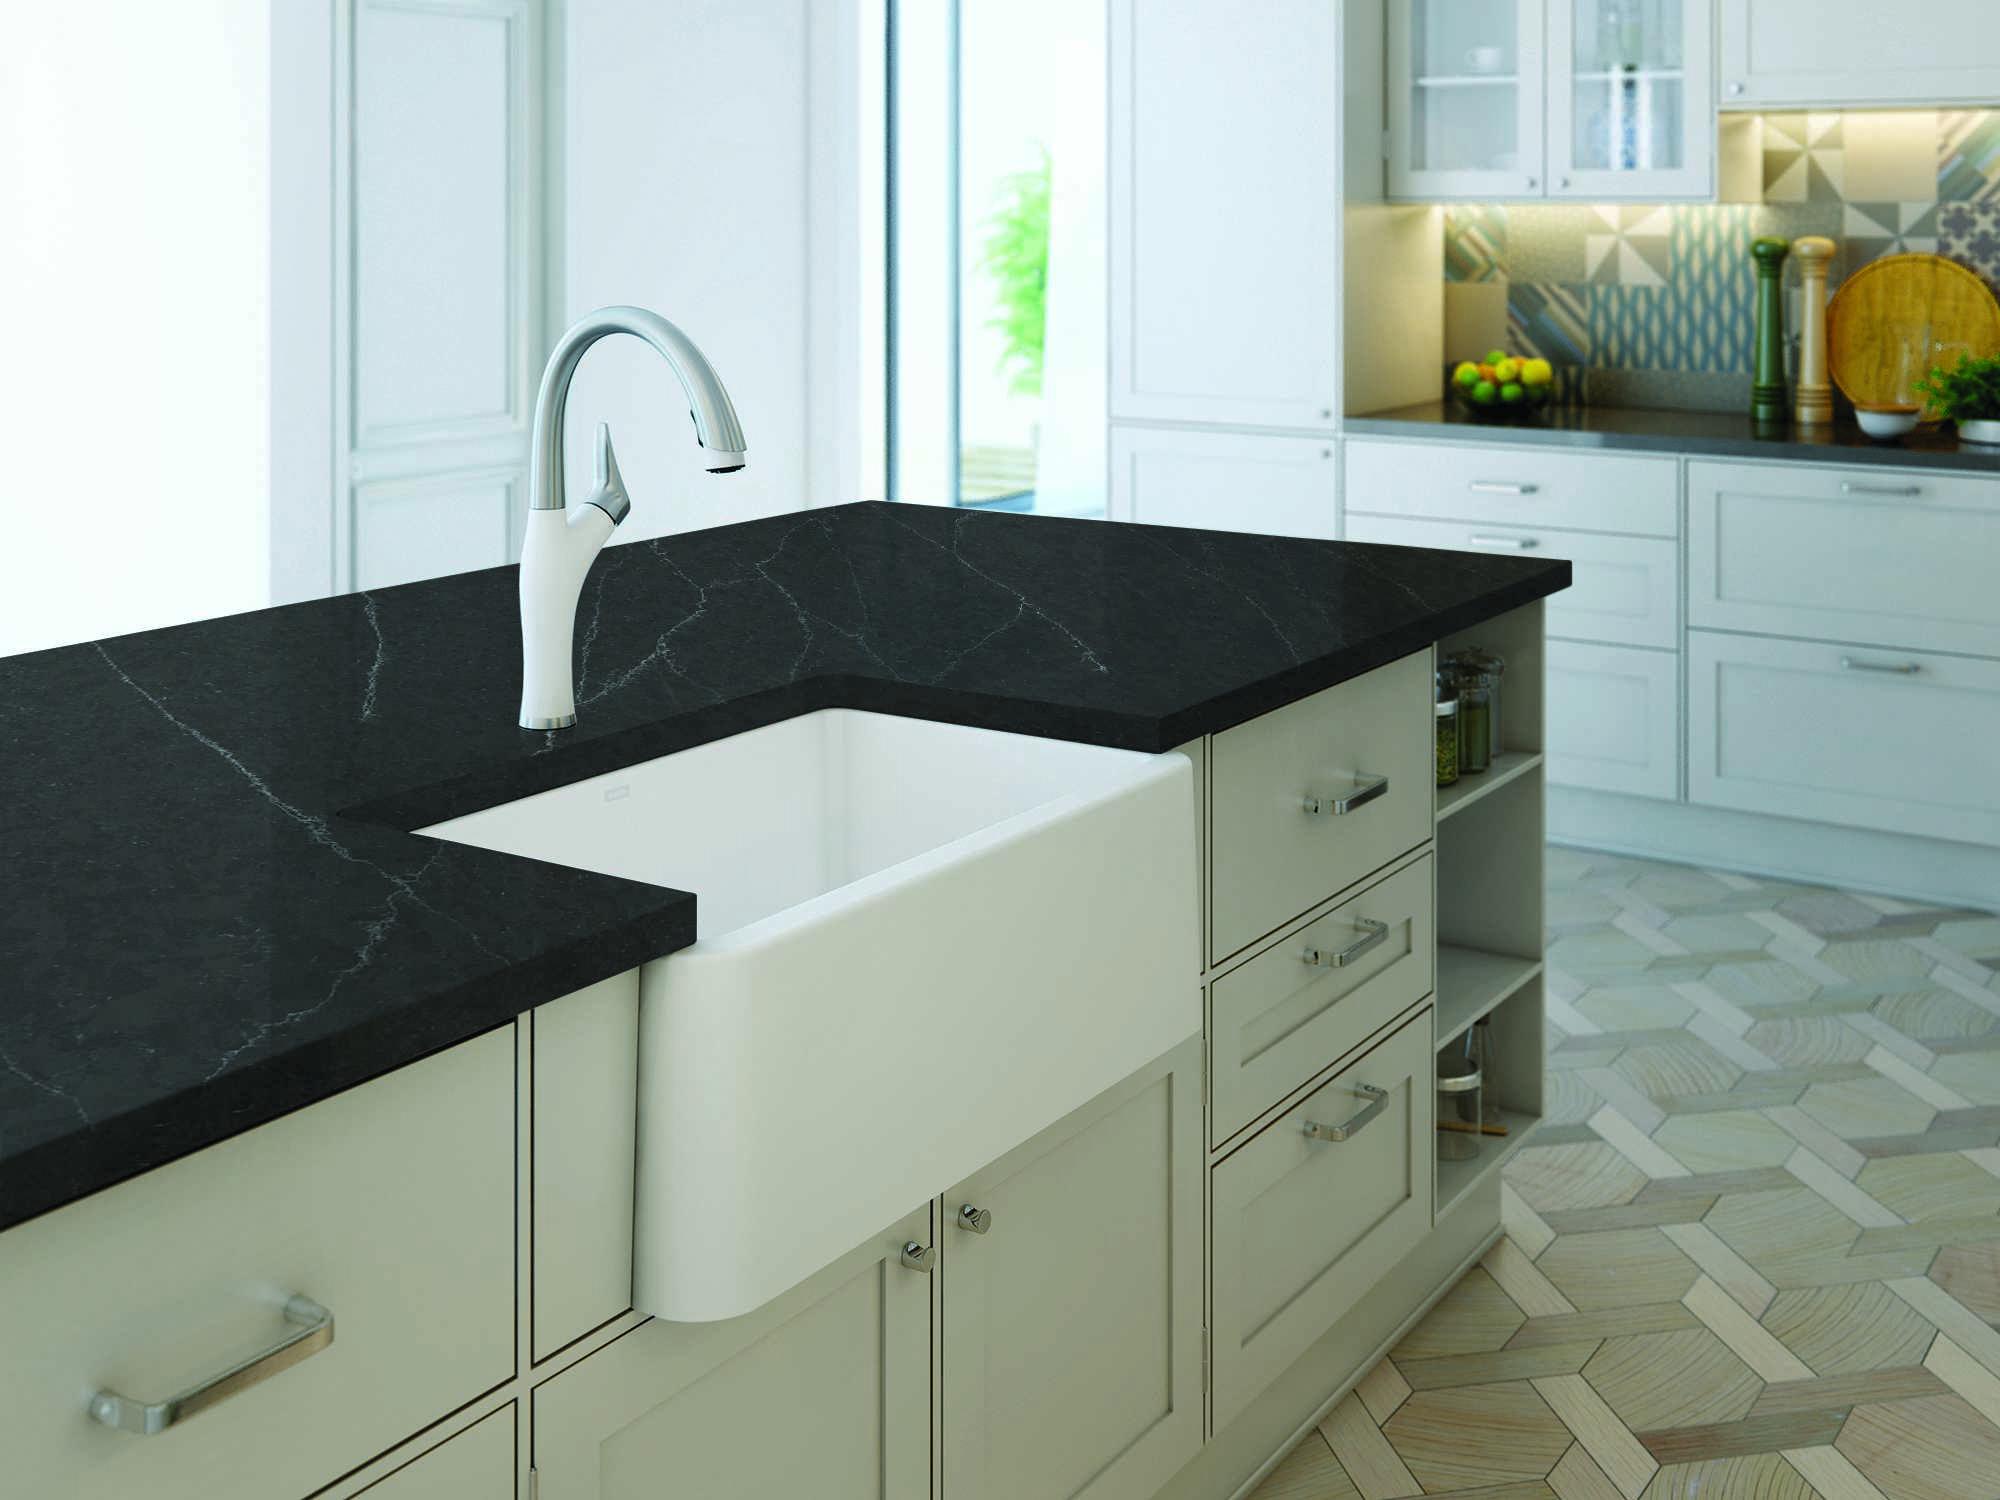 Gallery Pure Surfaces Quartz Surfacing Marble Design Countertop Materials